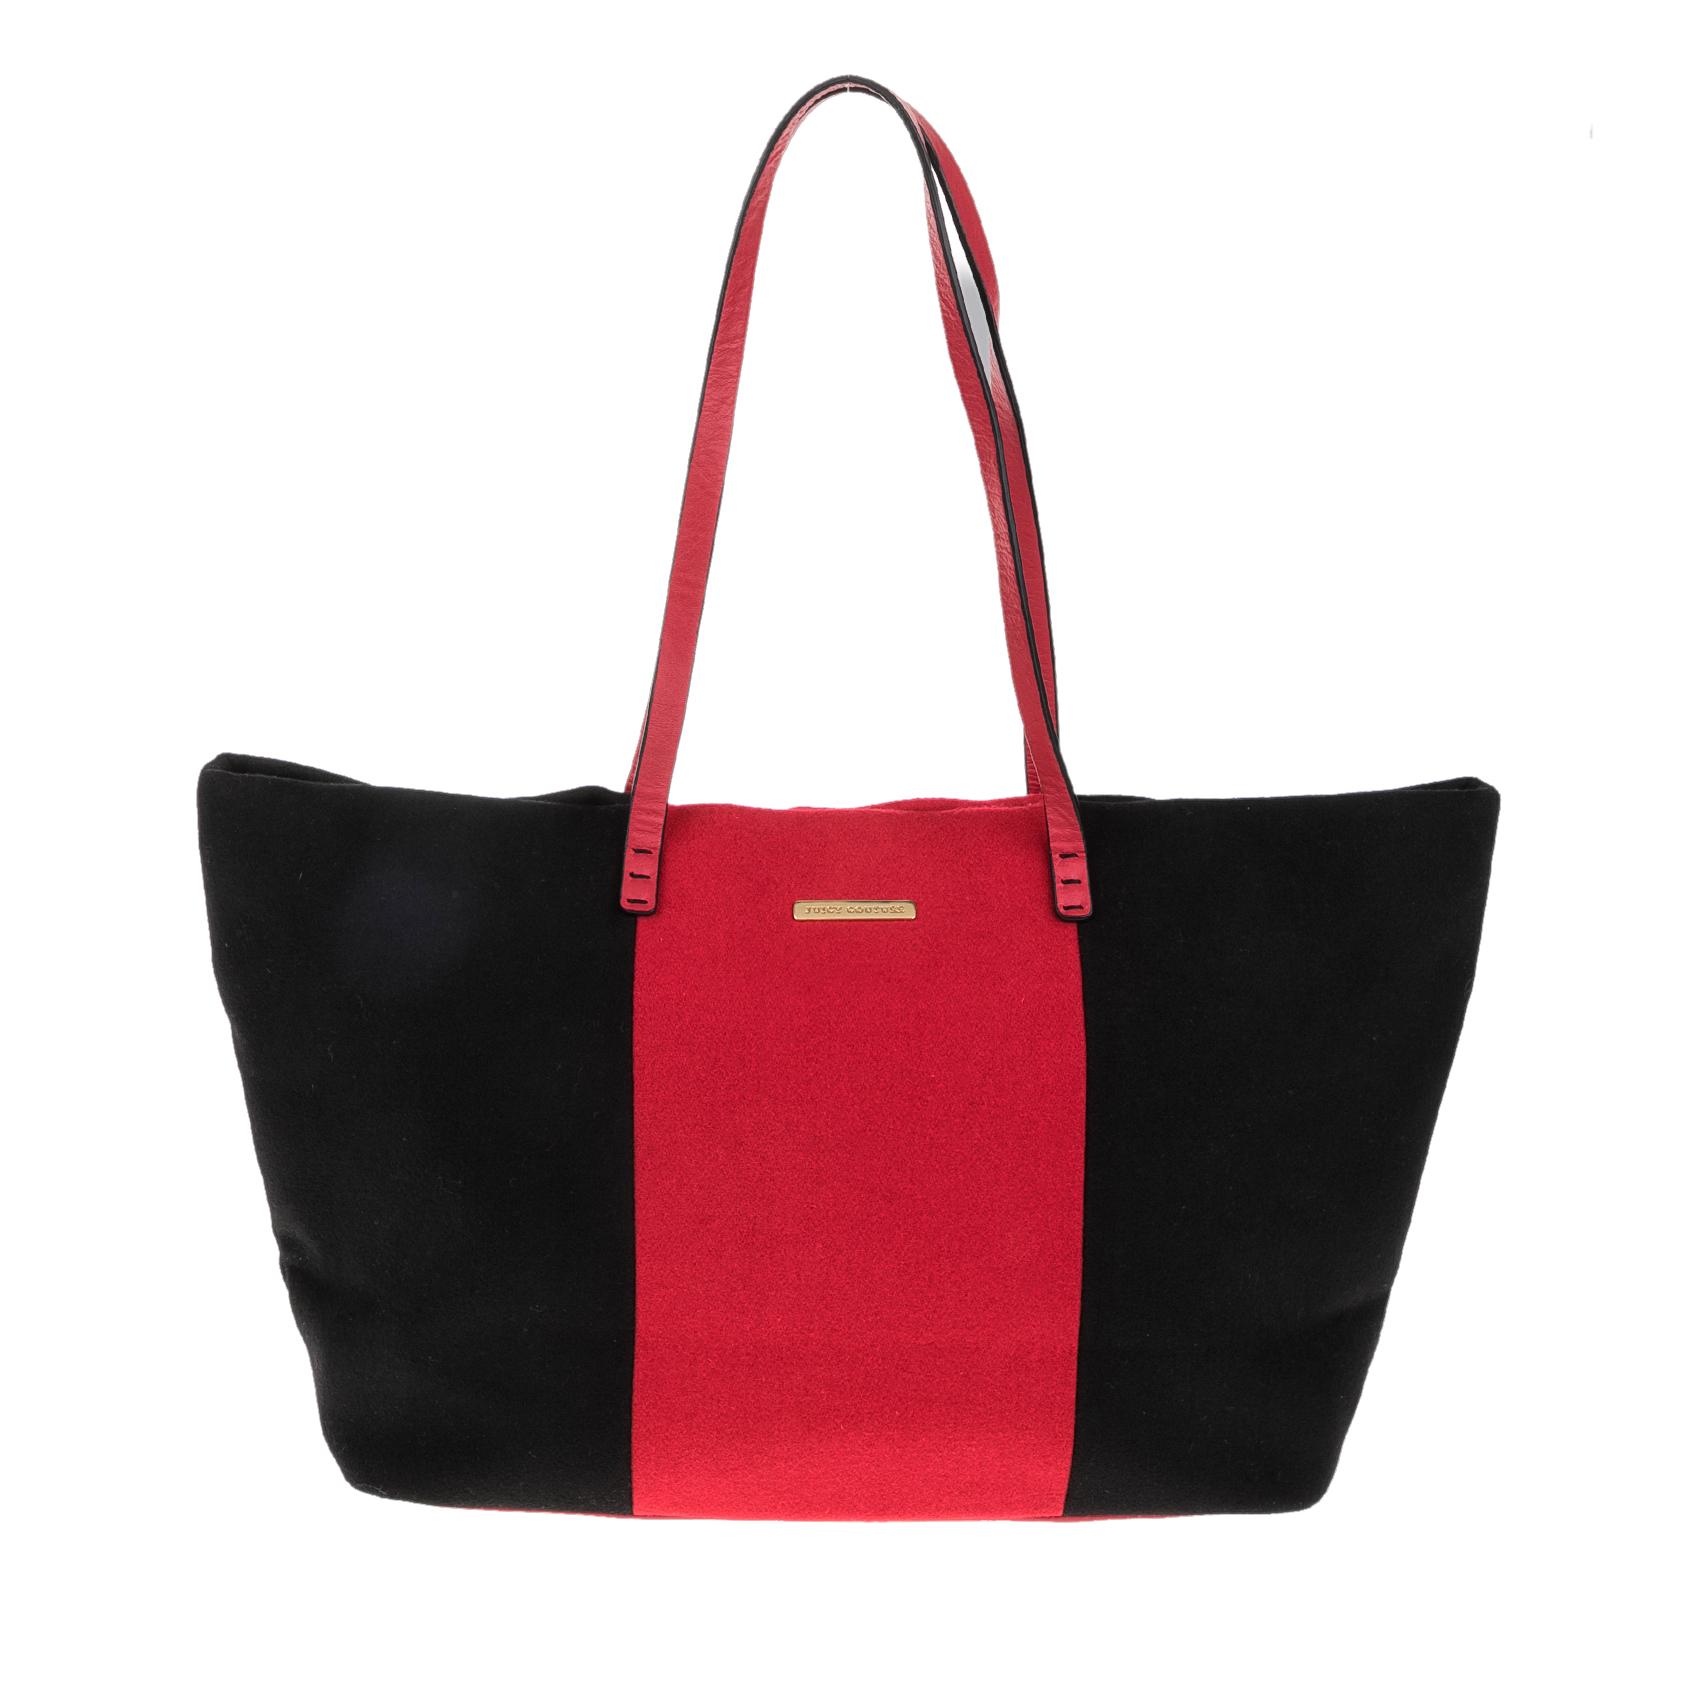 JUICY COUTURE – Γυναικεία τσάντα JUICY COUTURE EXCLUSIVE MONOGRAM μαύρη-κόκκινη 1427951.0-7145